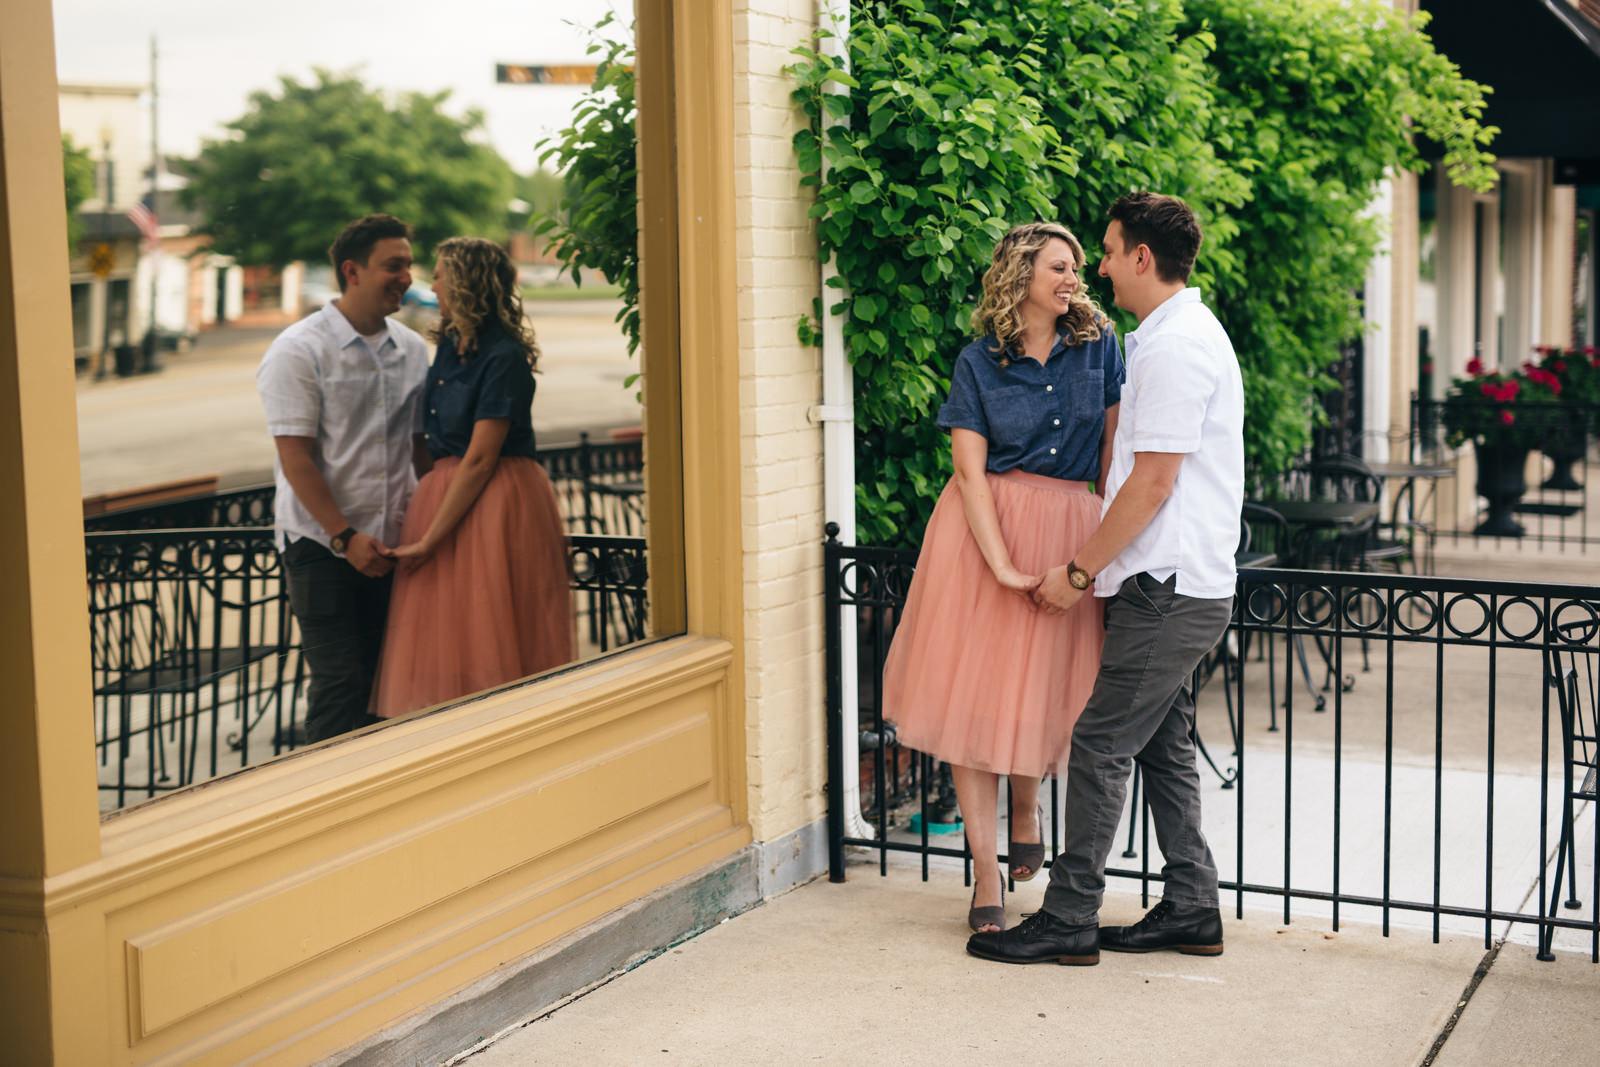 Stylish engagement session with tulle skirt in Northwest Ohio.